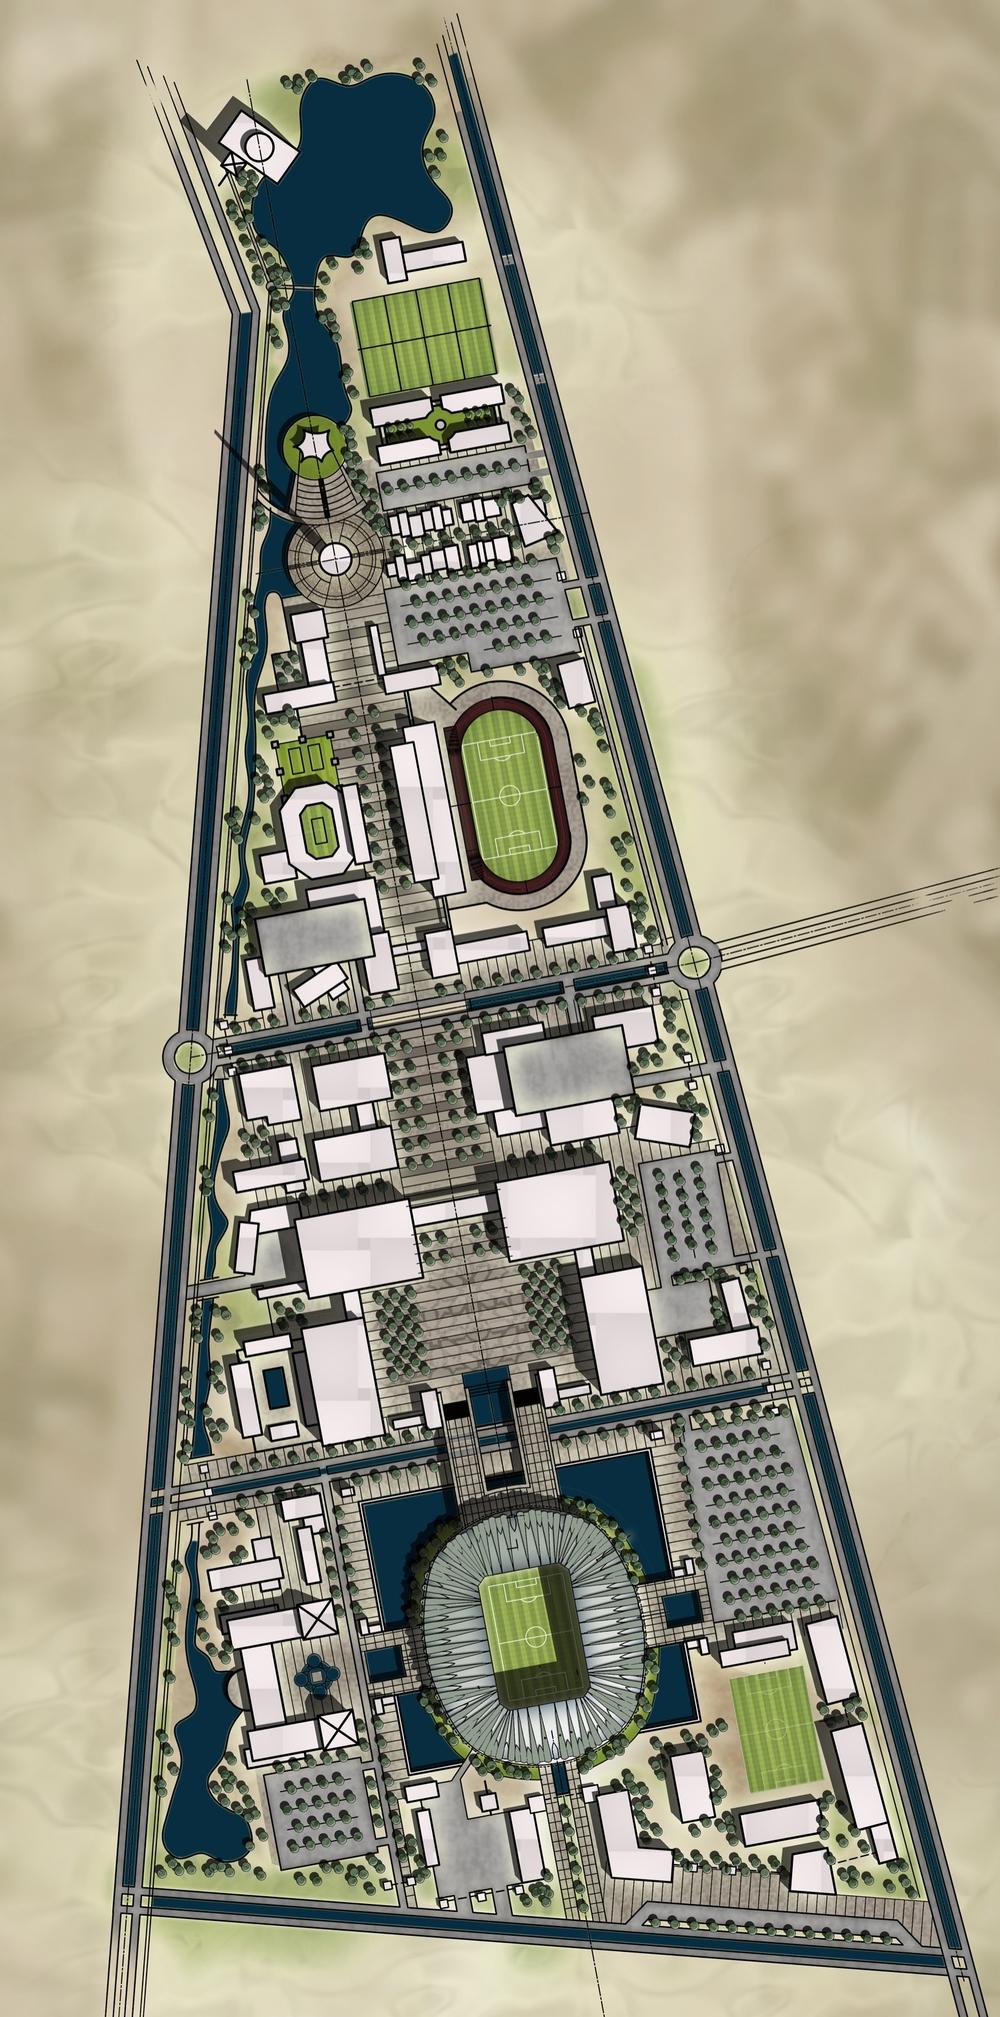 siteplan_al-hillah.jpg